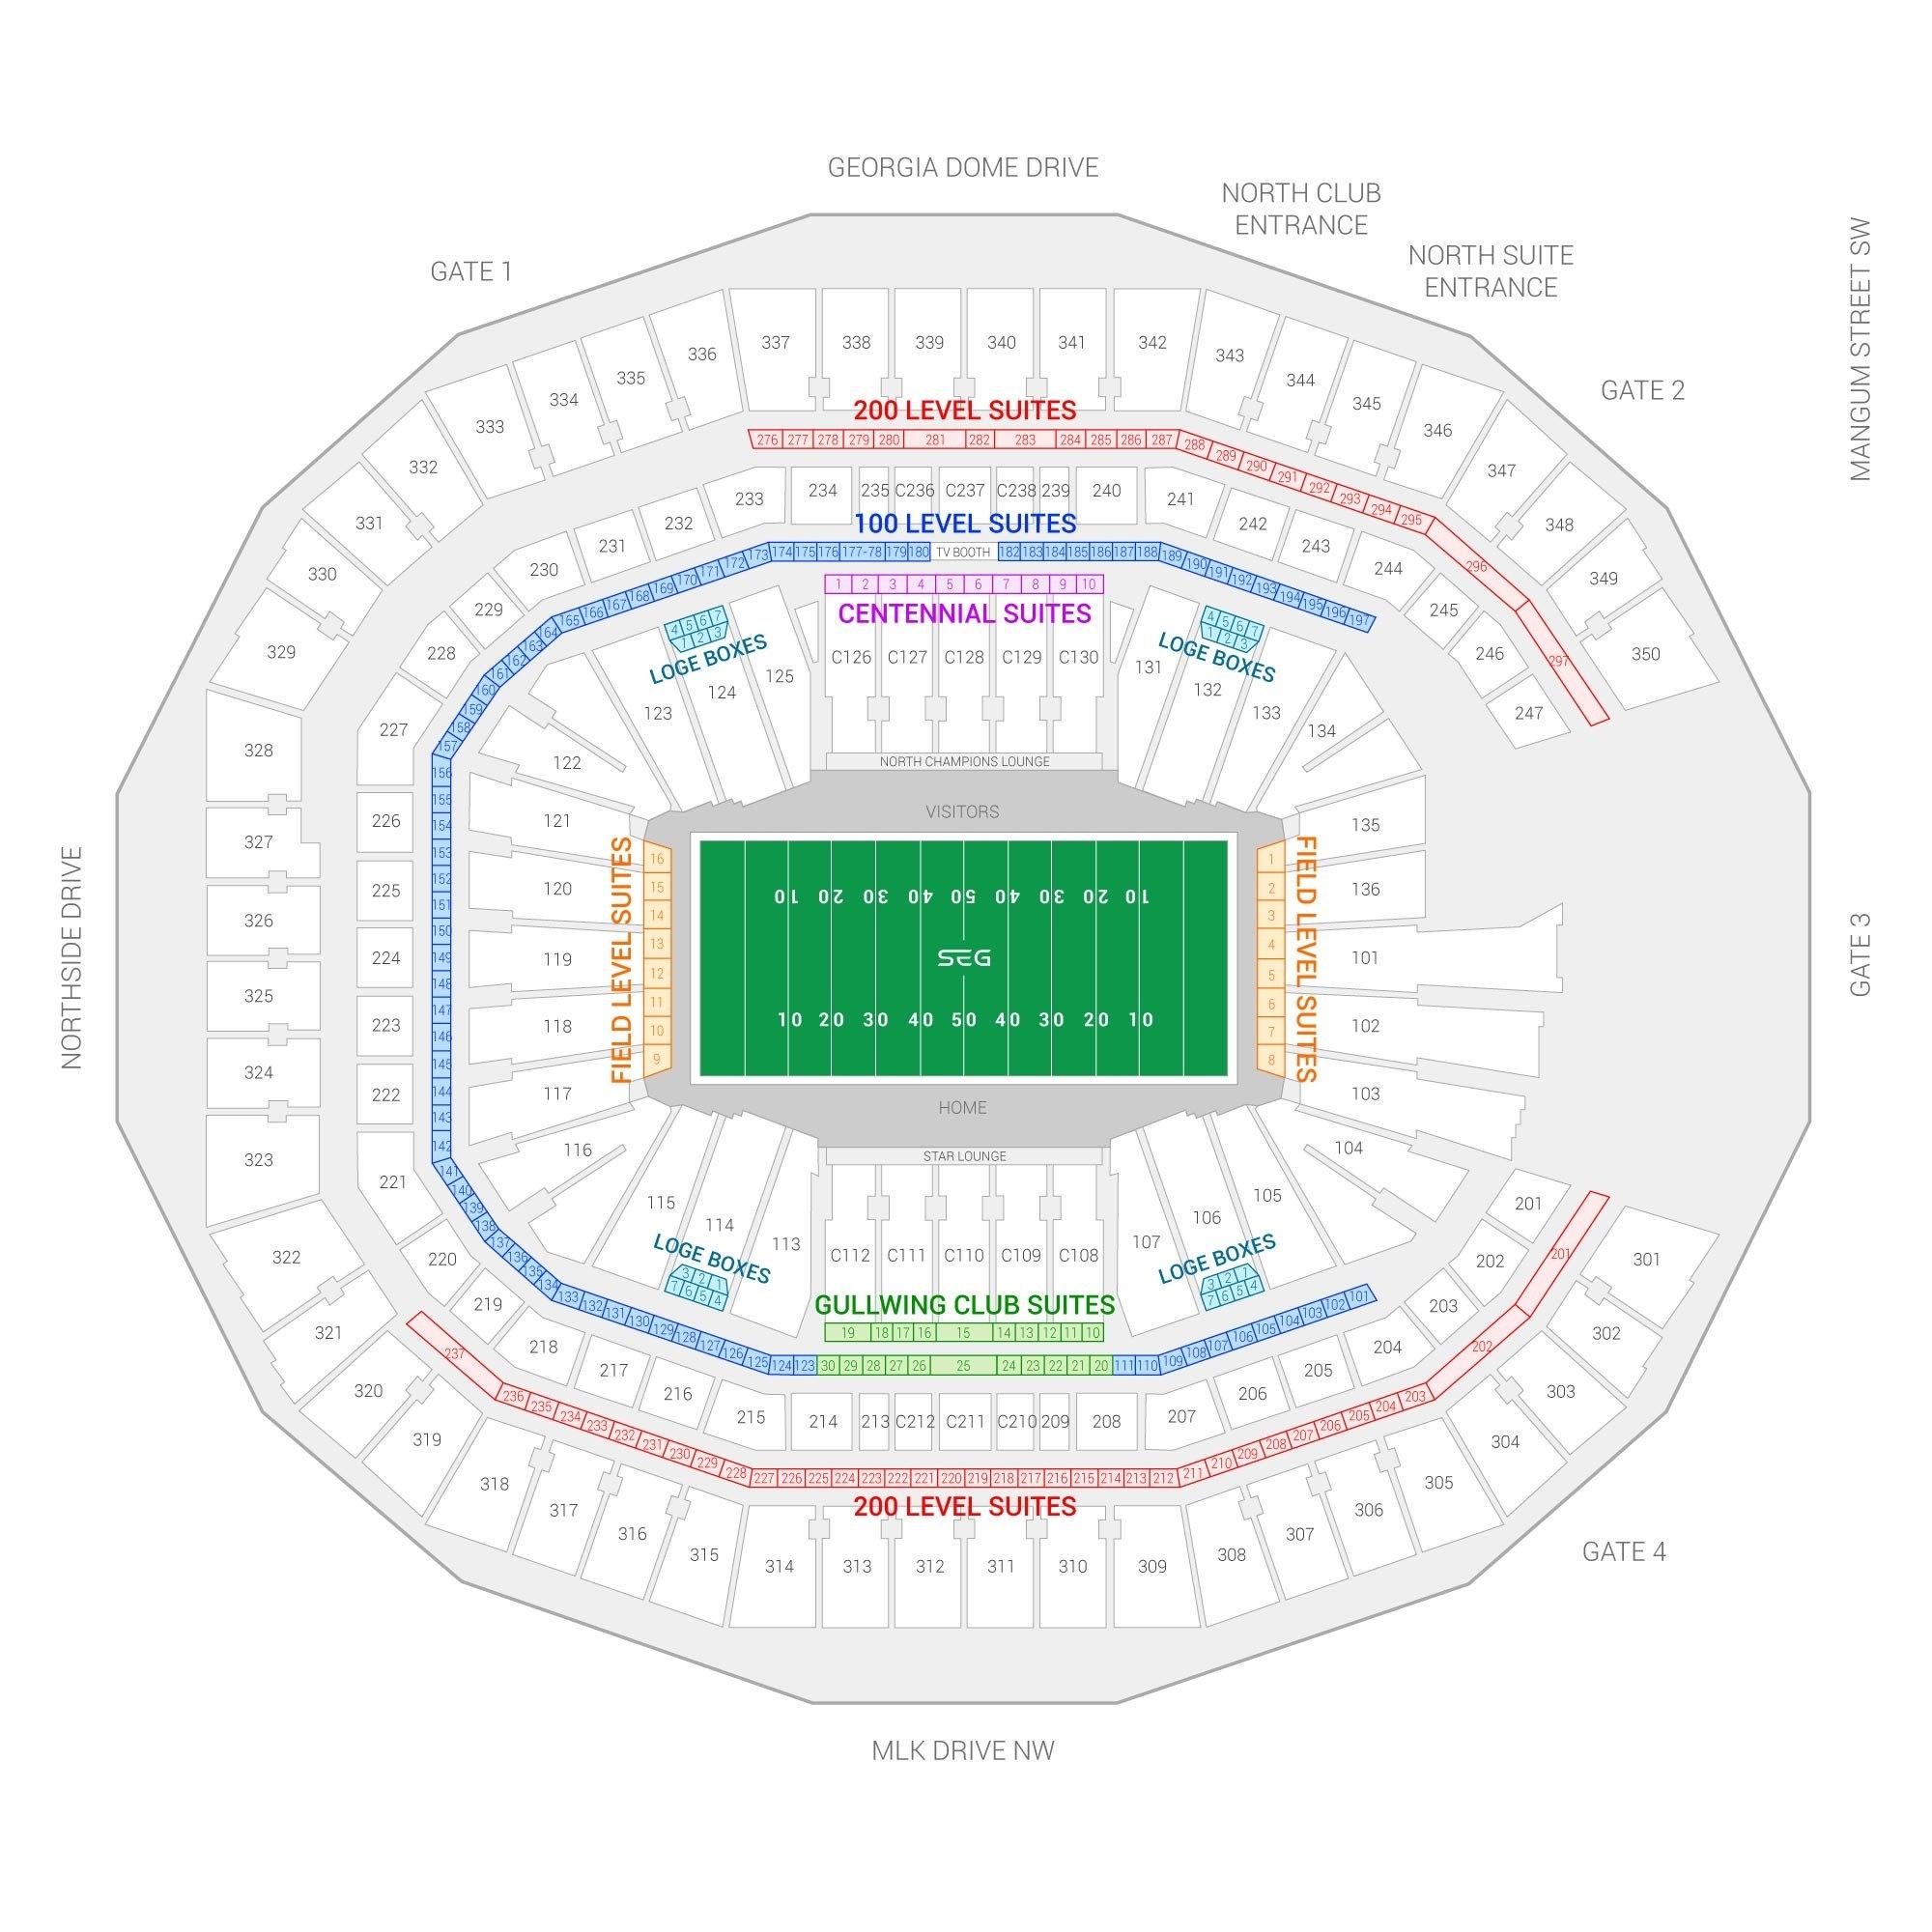 Super Bowl Liii Suite Rentals | Mercedes-Benz Stadium inside Super Bowl Tickets Seating Chart